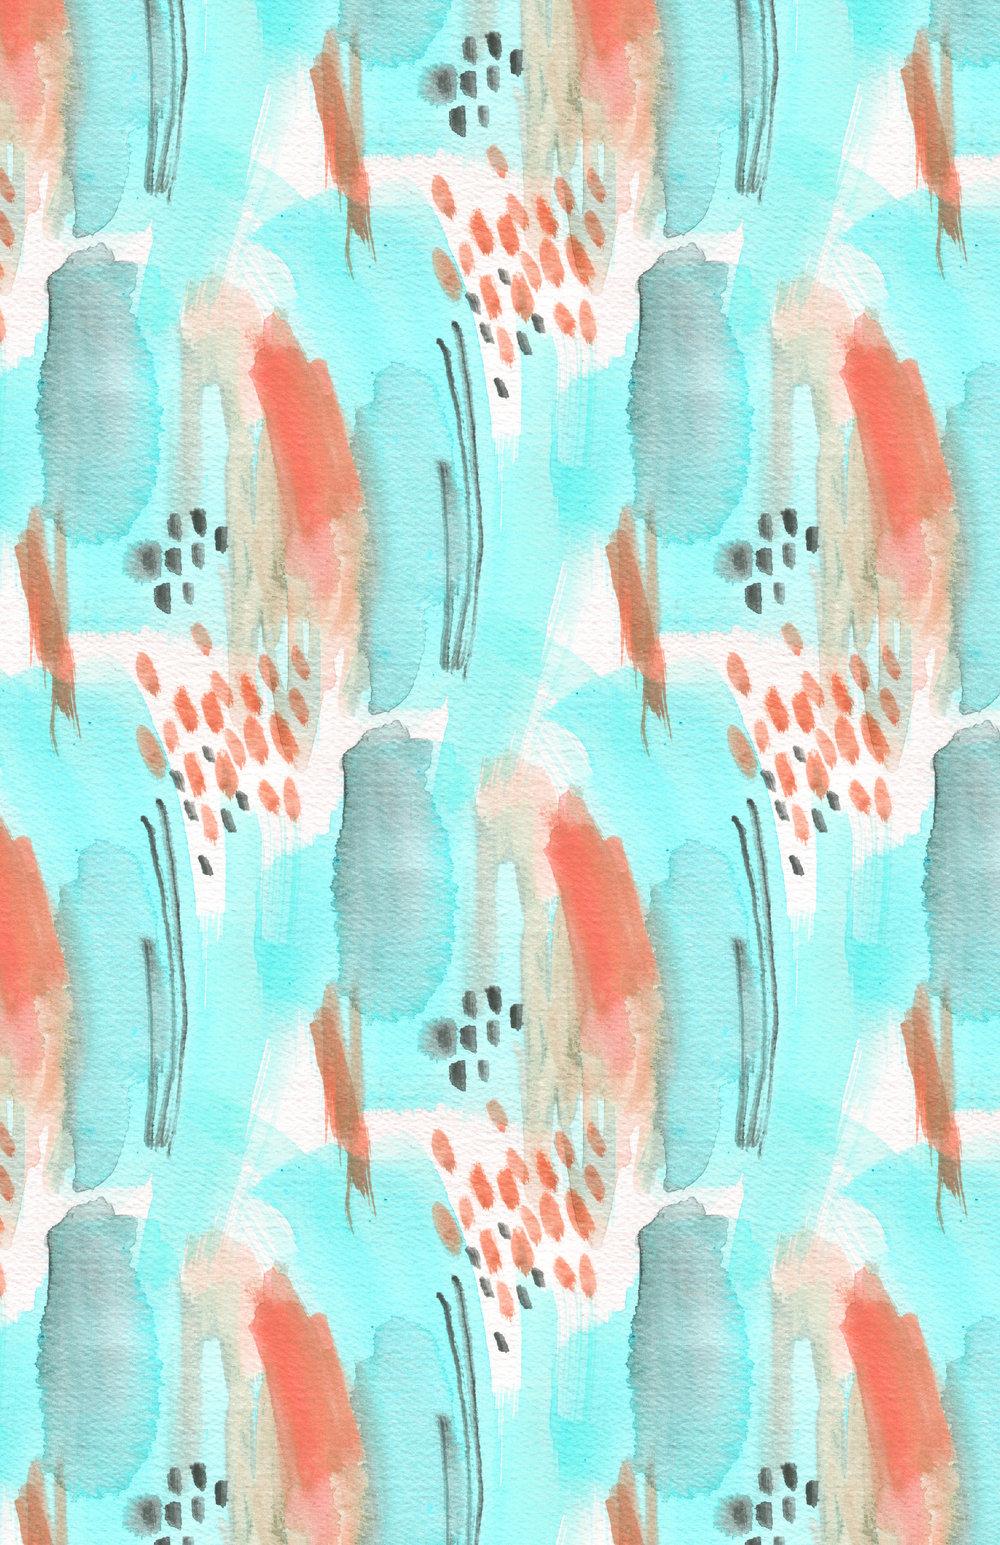 pattern55-01.jpg